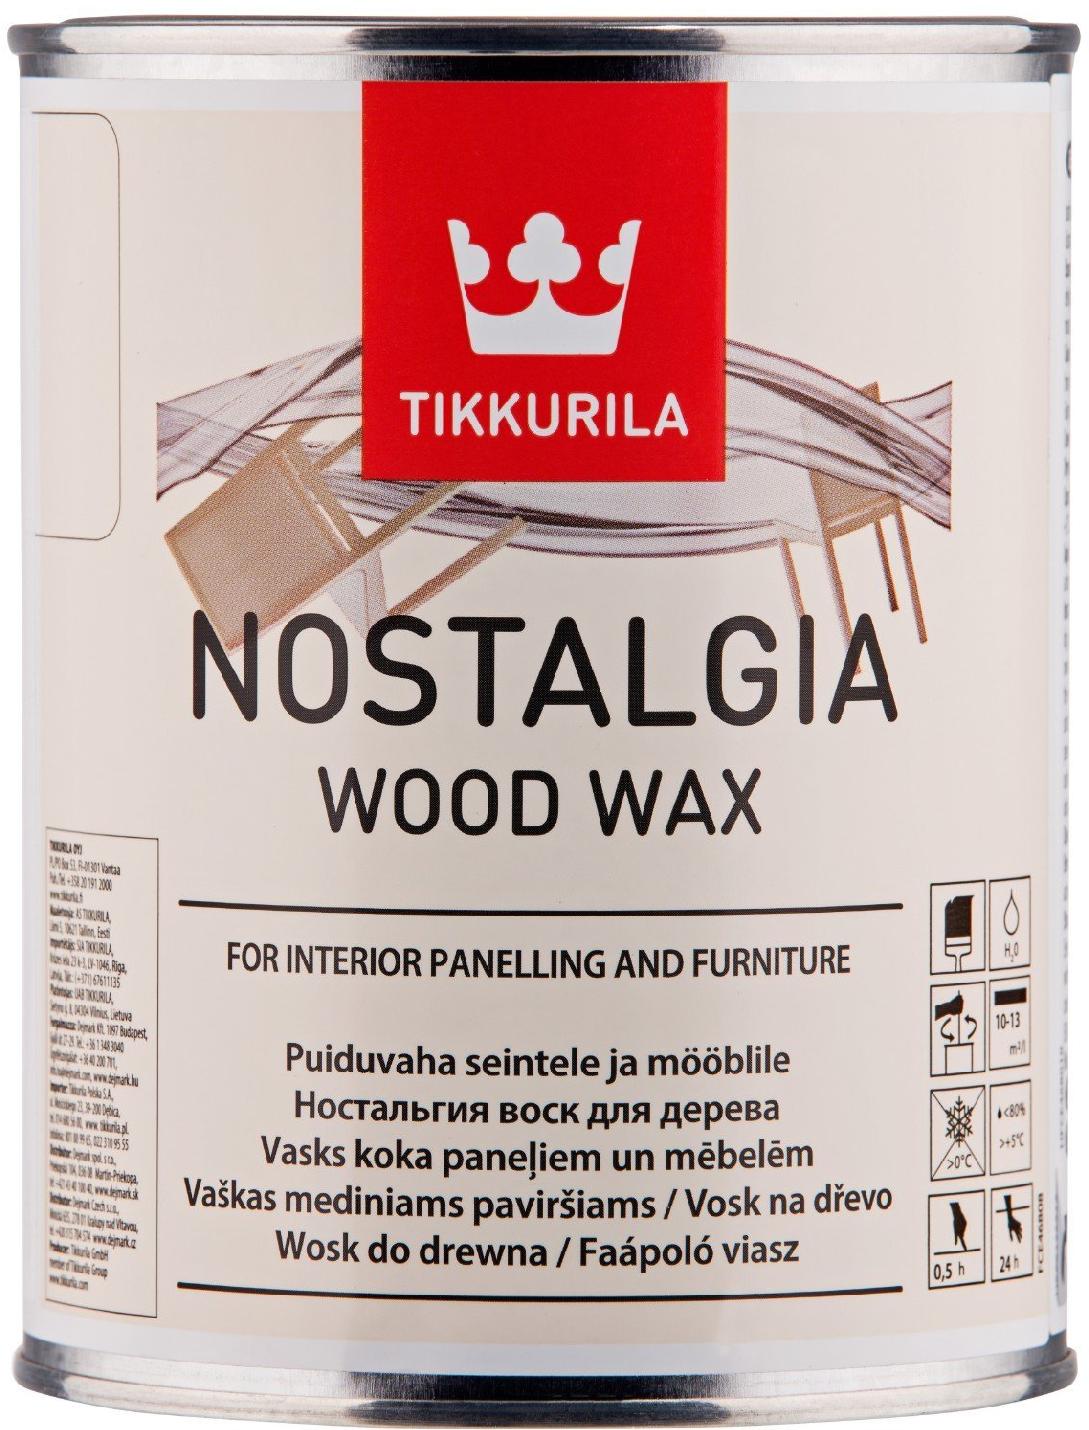 Tikkurila NOSTALGIA WOOD WAX (Tekutý vosk na dřevo)